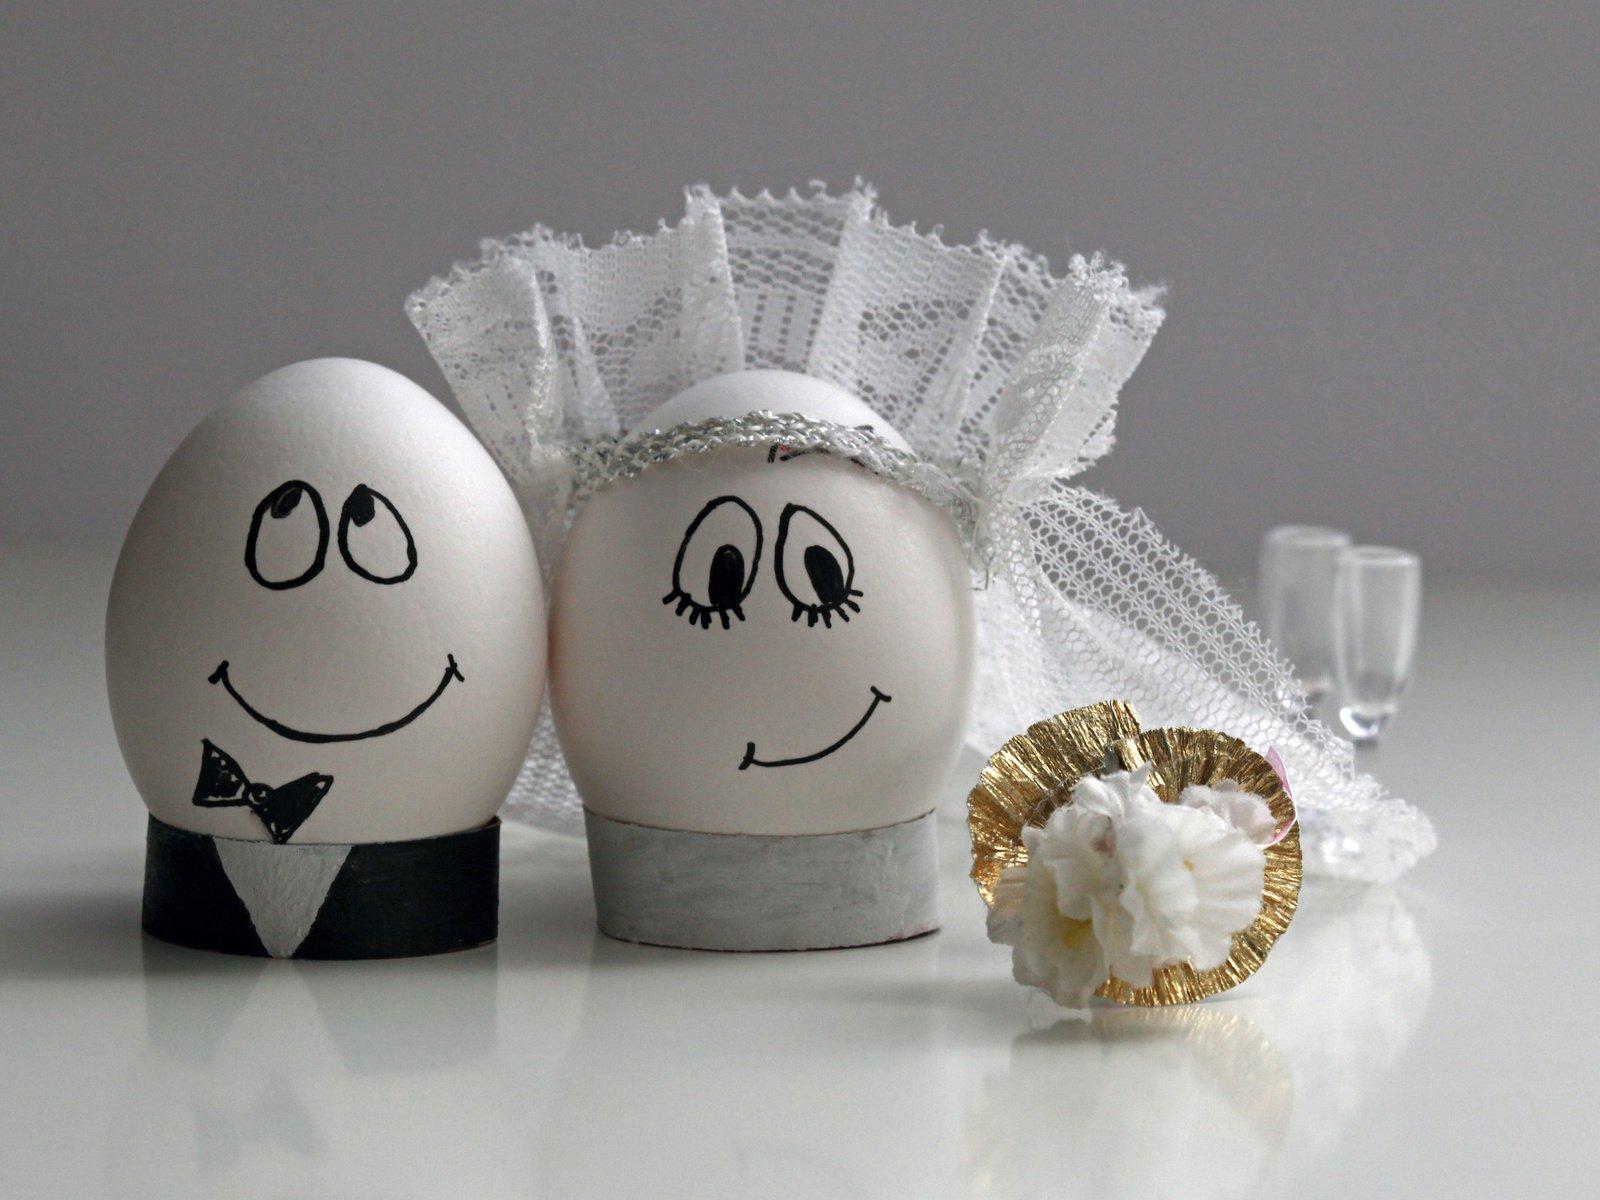 яйца, юмор, свадьба